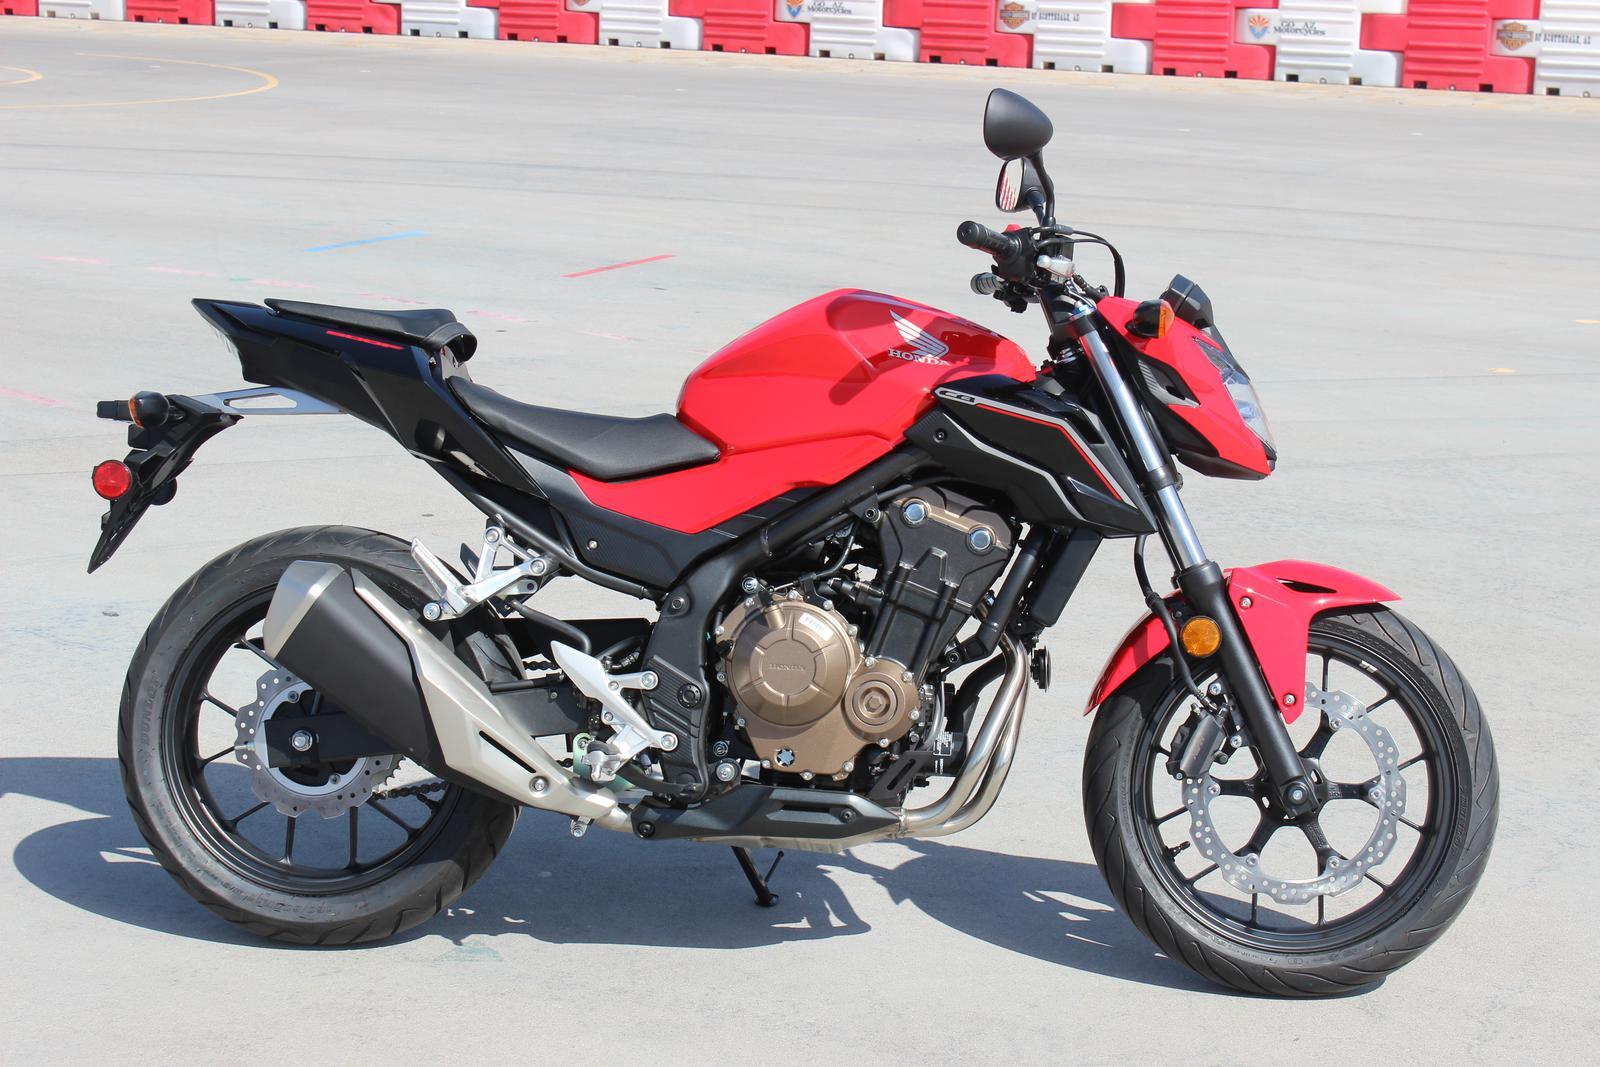 2017 honda cbr500r for sale in scottsdale, az | go az motorcycles